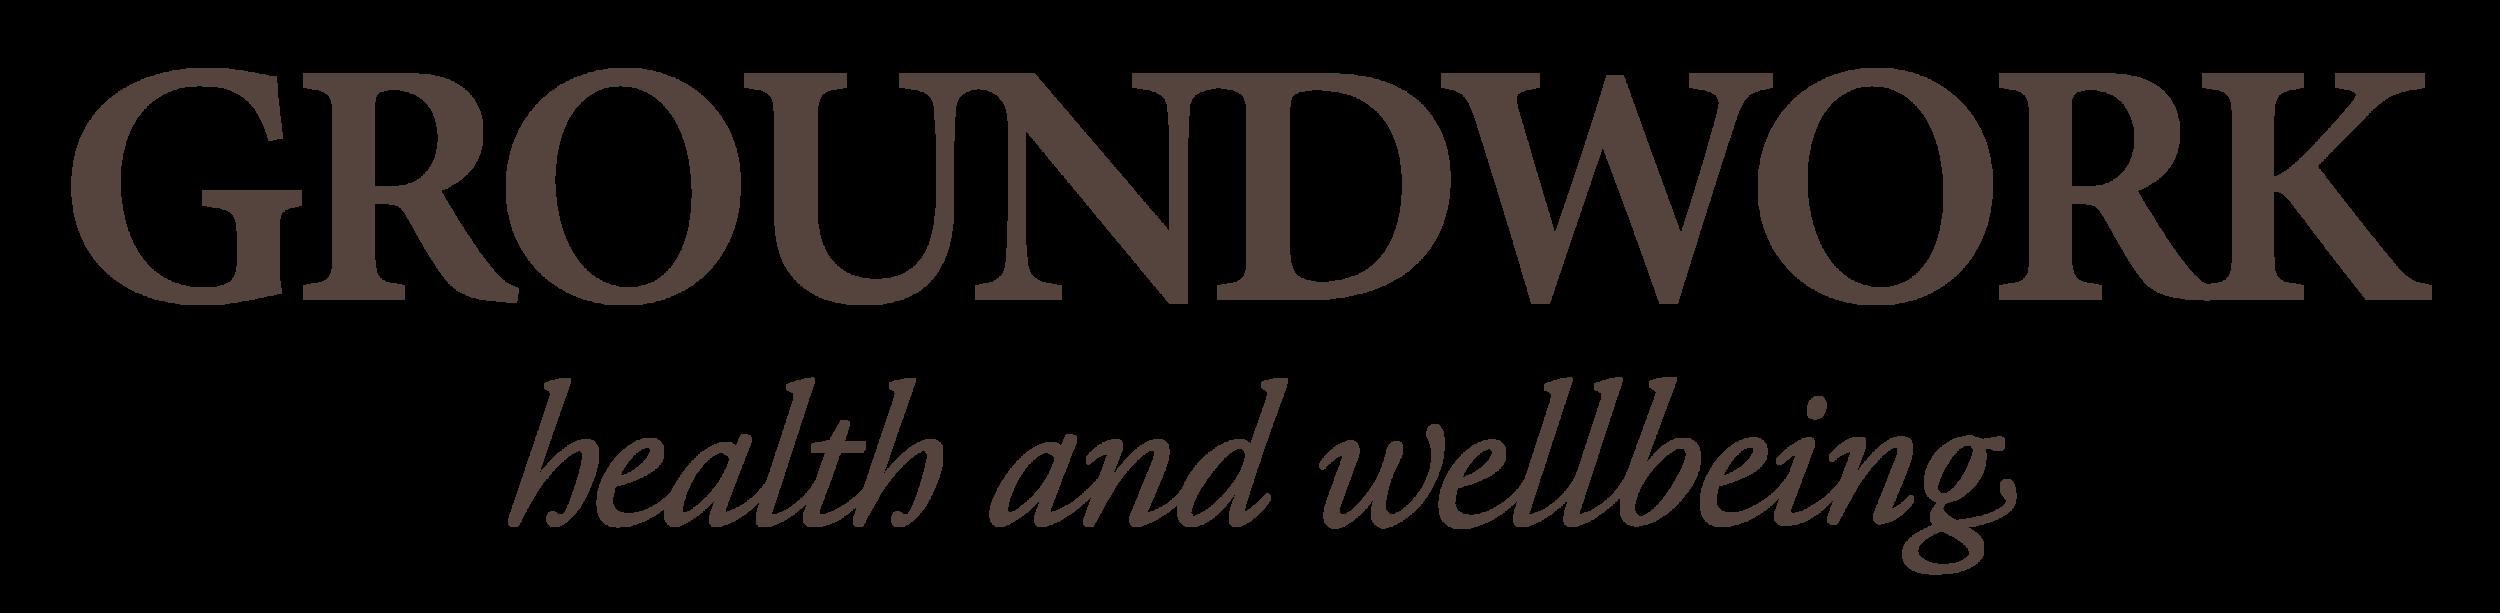 Groundwork Wellbeing Header Logo-01.png